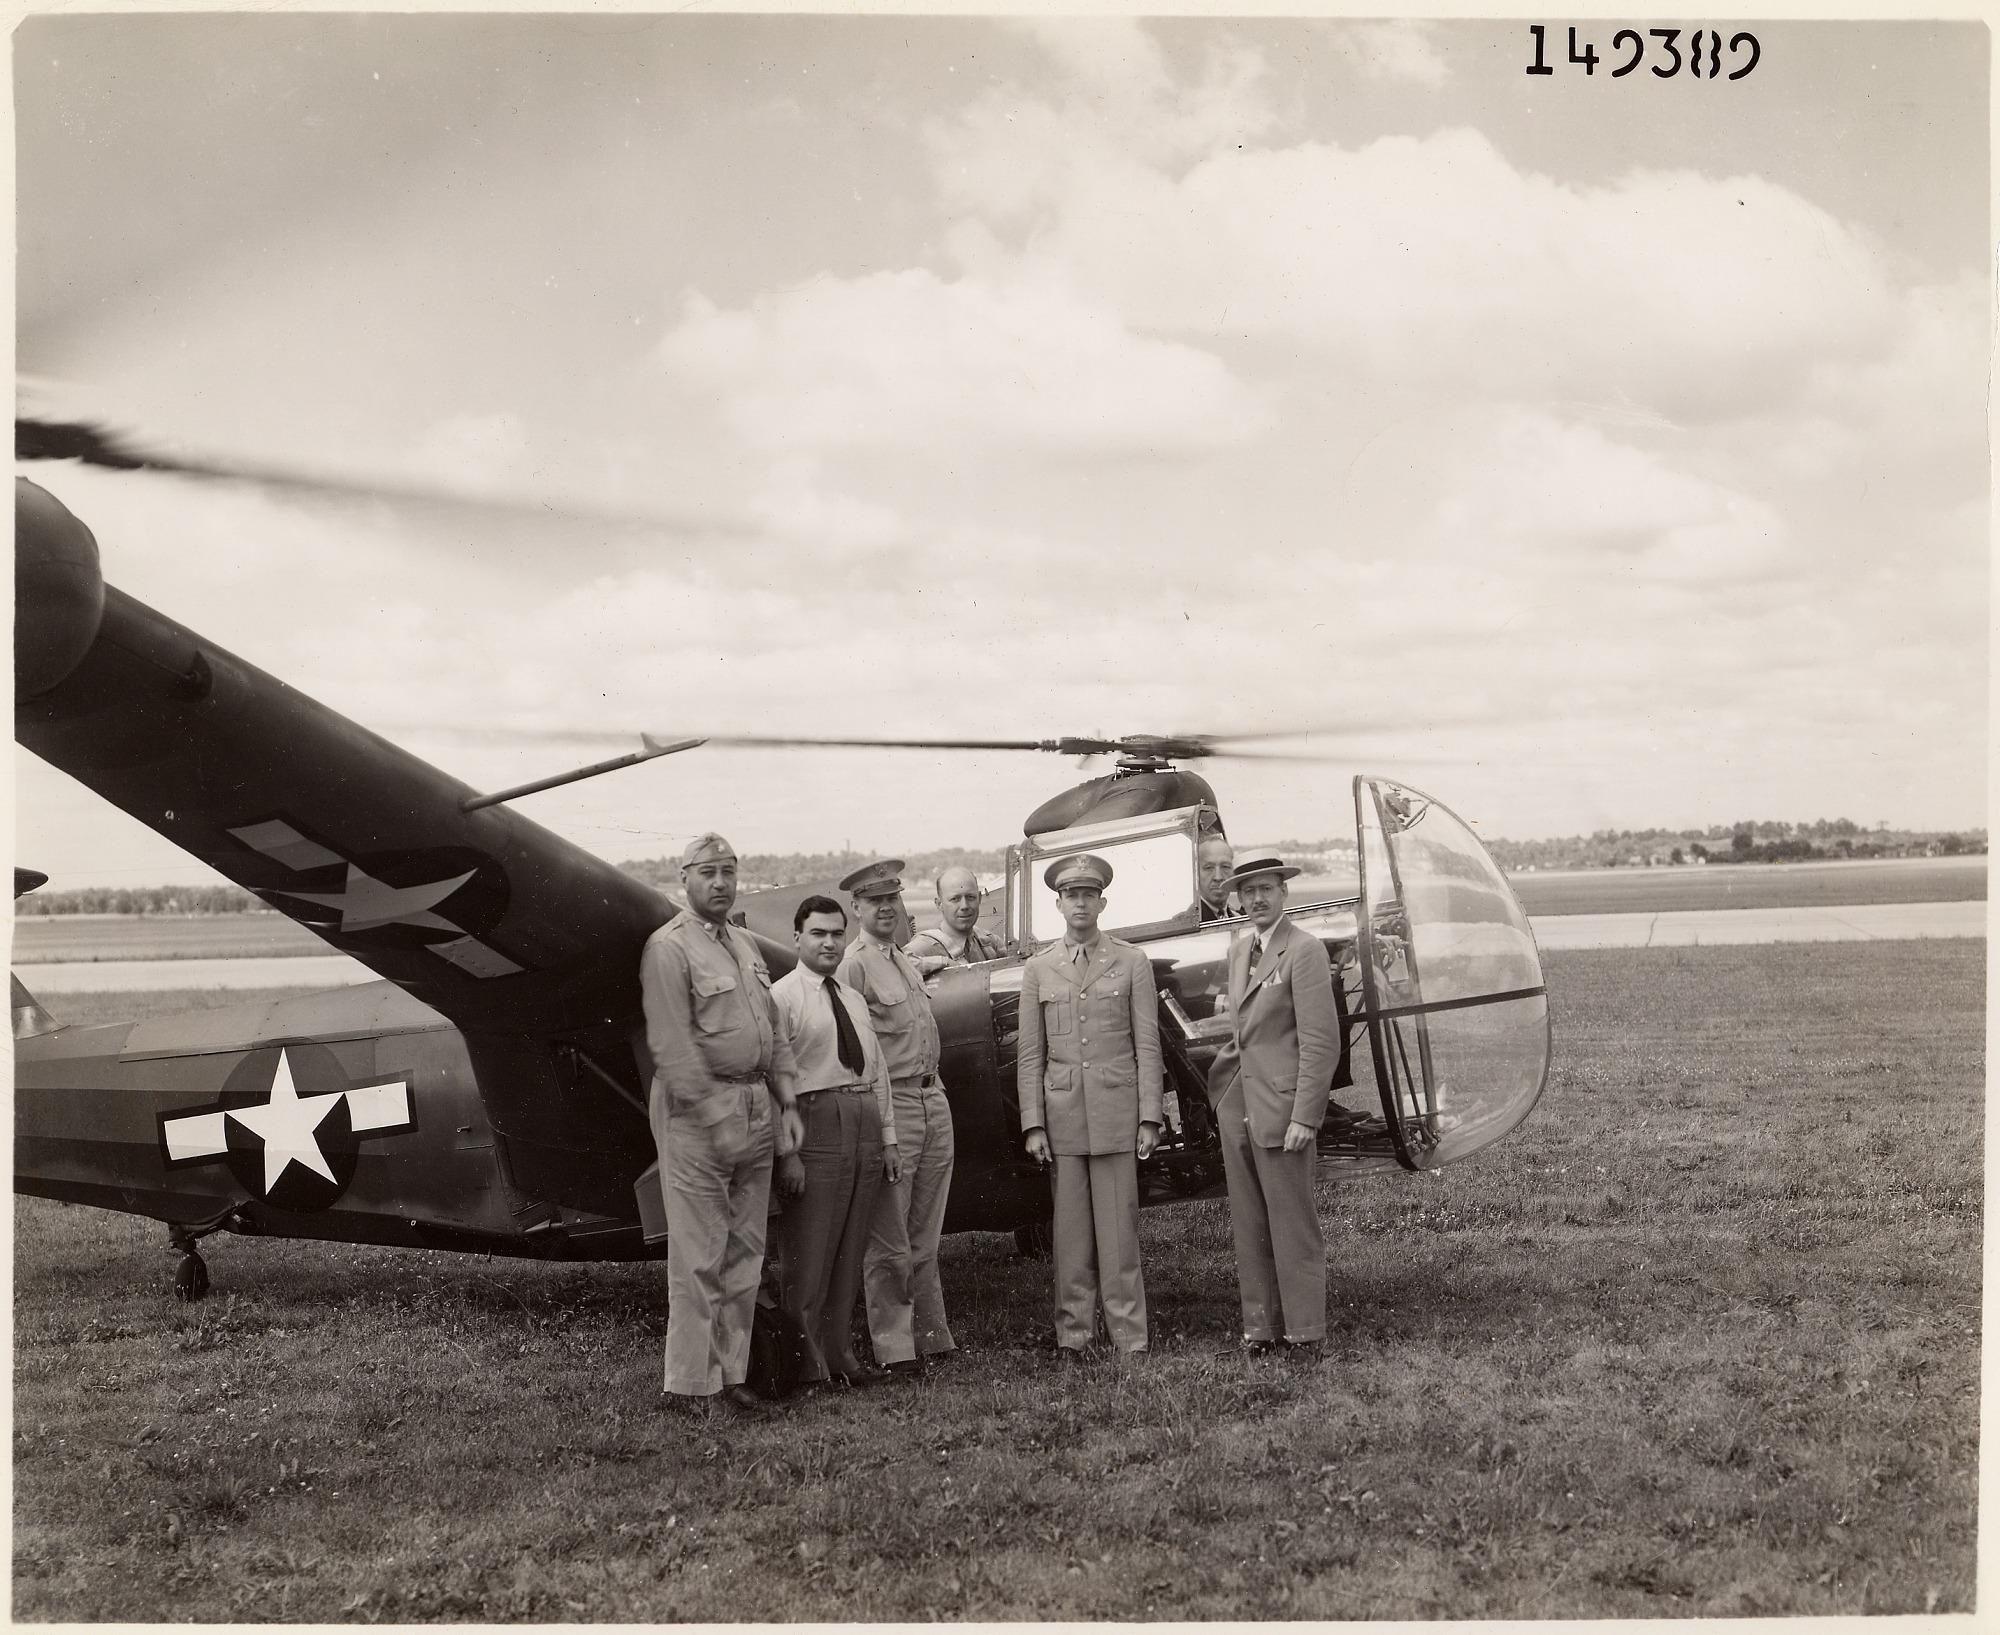 Mandel Lenkowsky Early Vertical Flight Development Collection